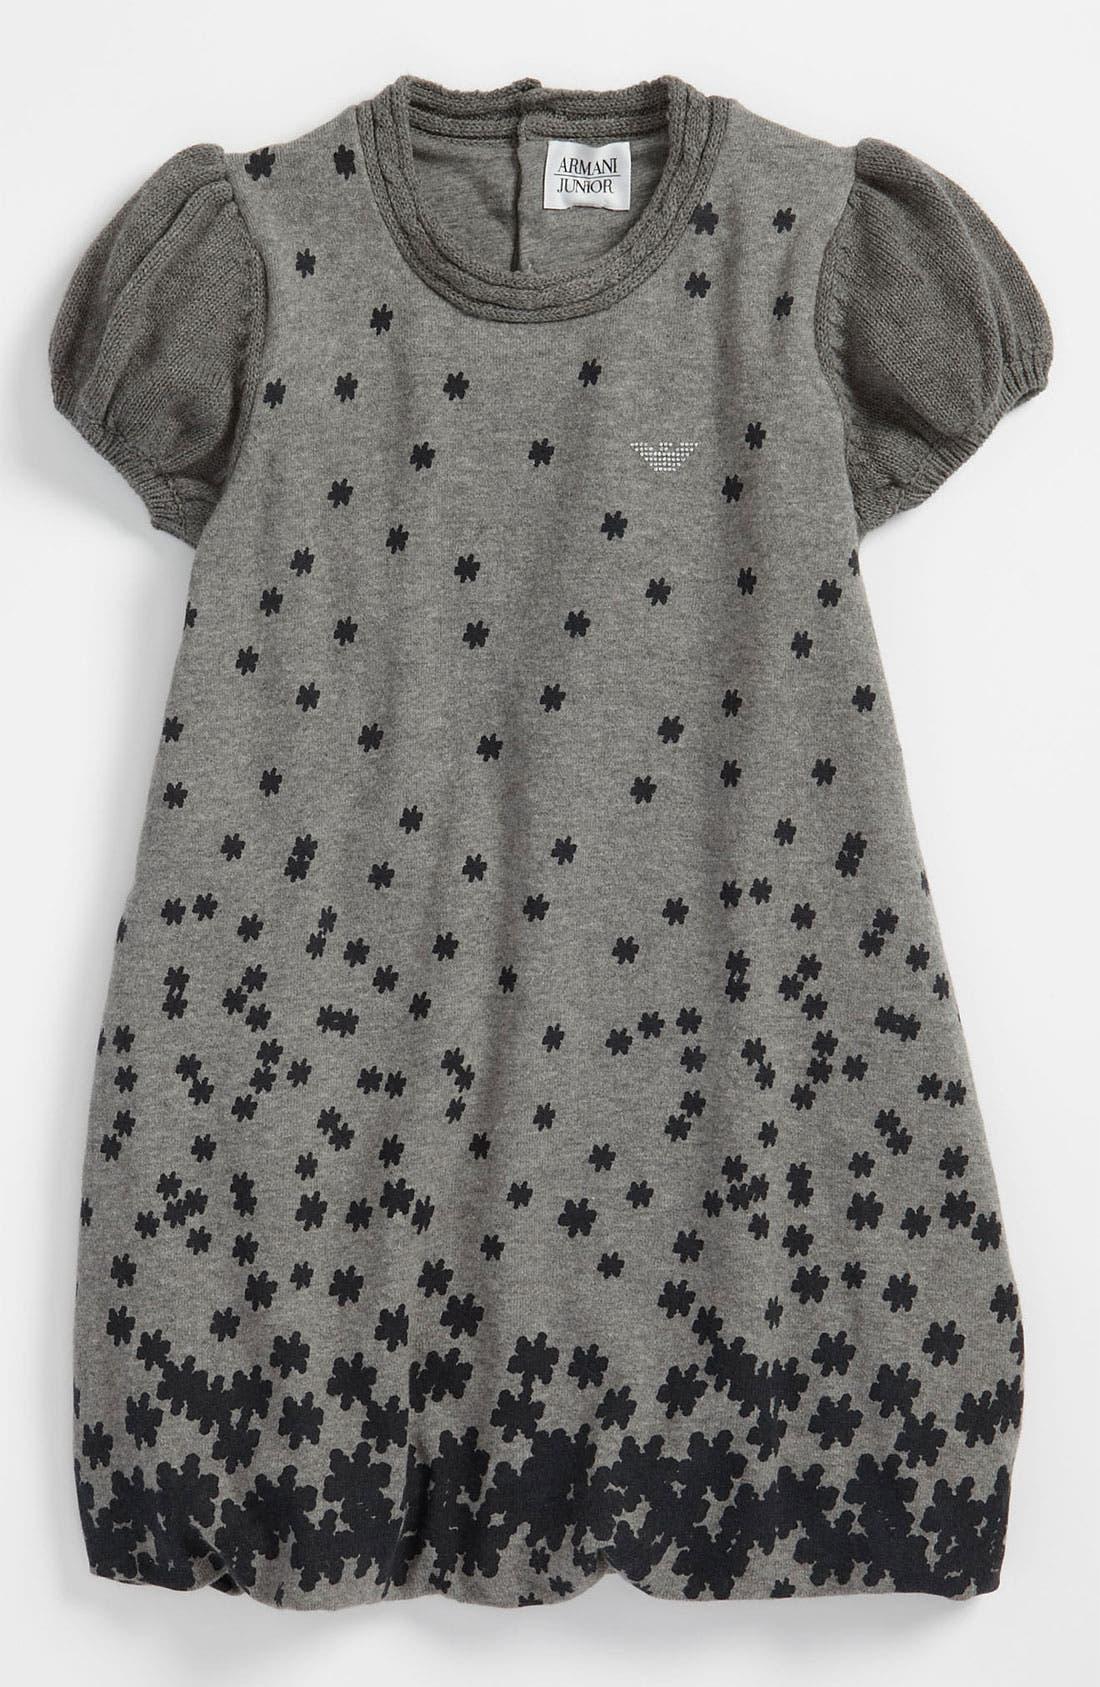 Main Image - Armani Junior Floral Dress (Toddler, Little Girls & Big Girls)